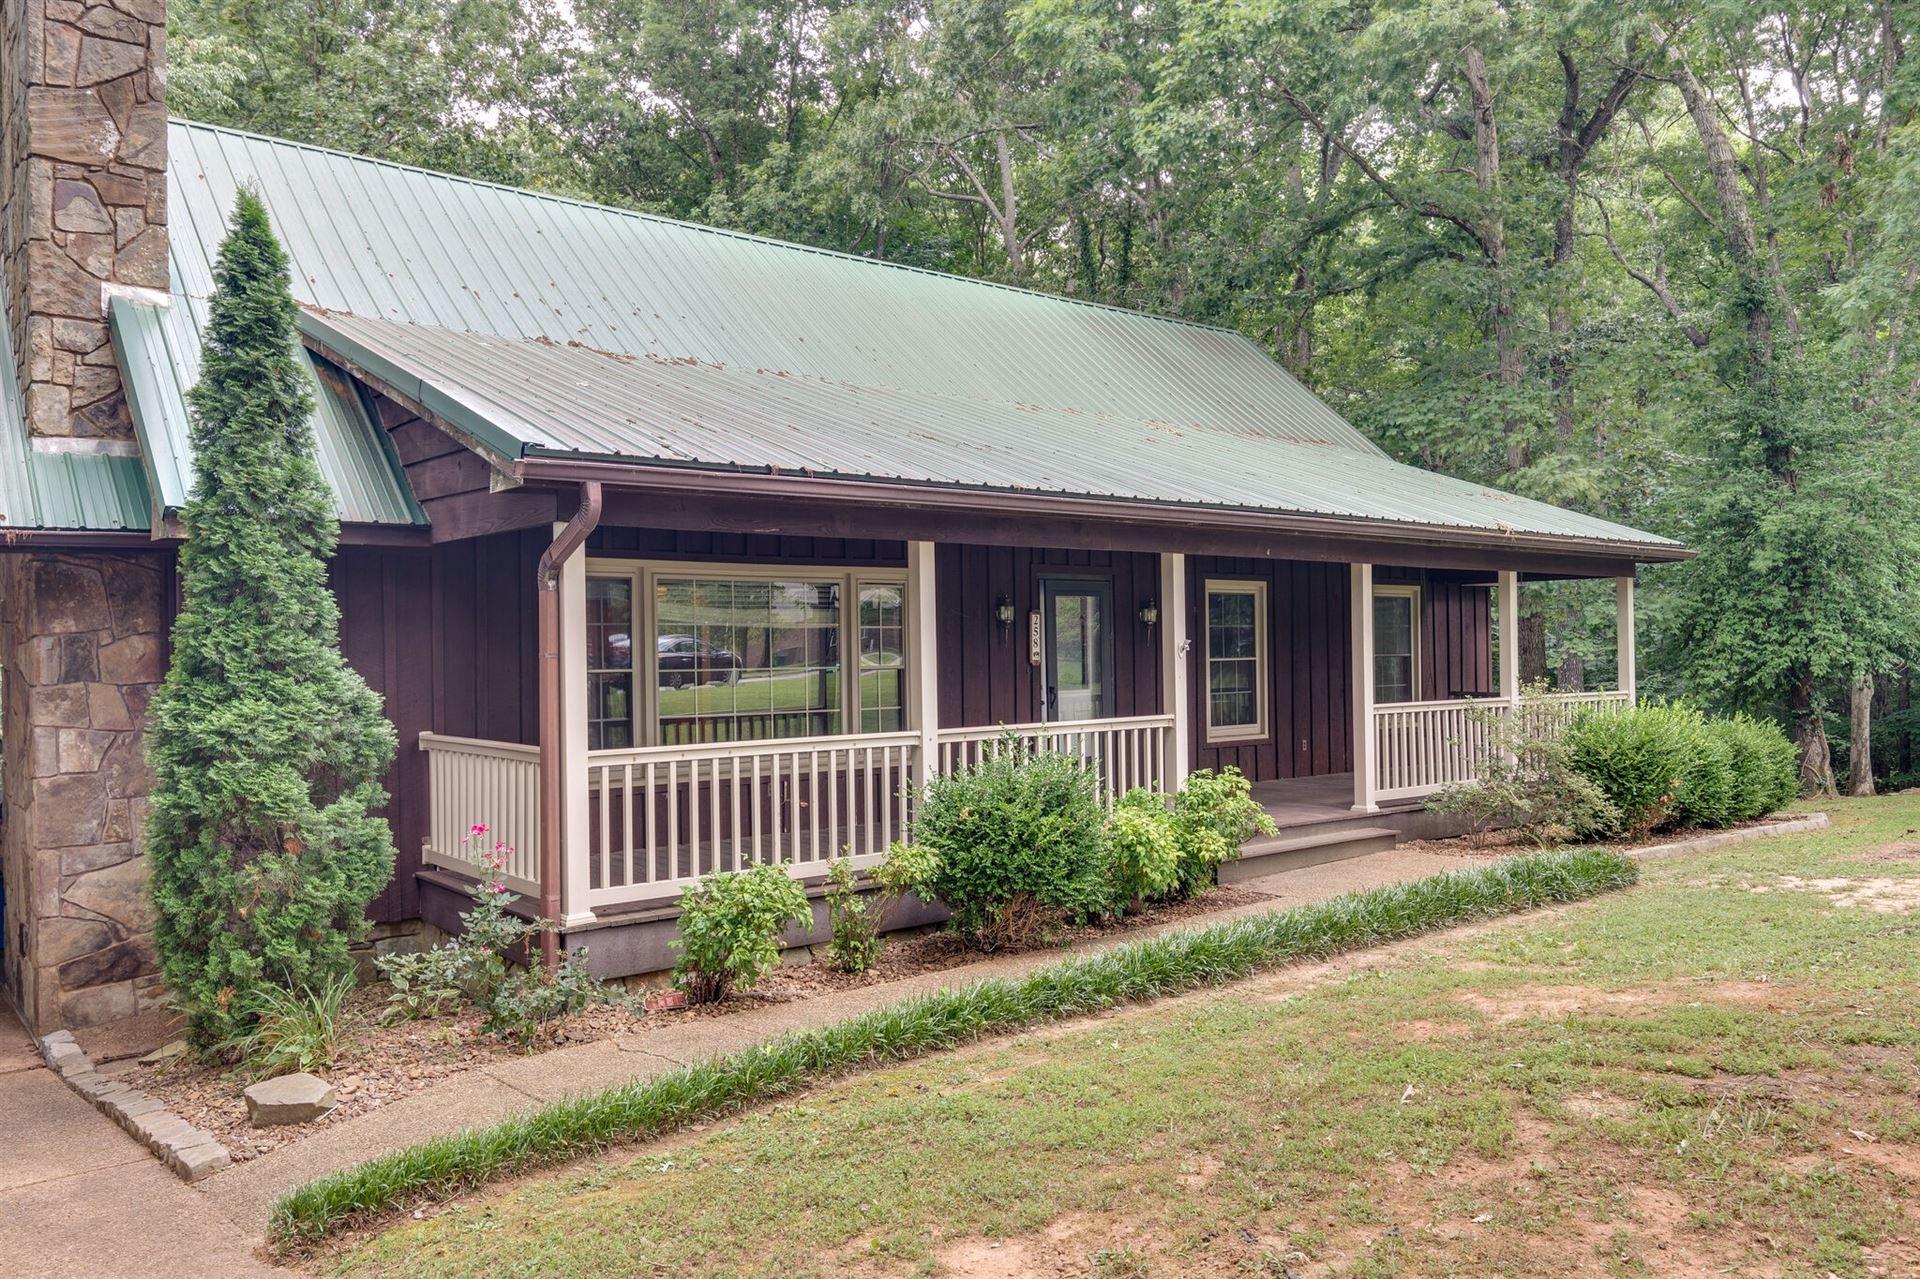 258 Oak Cir, Winchester, TN 37398 - MLS#: 2290816